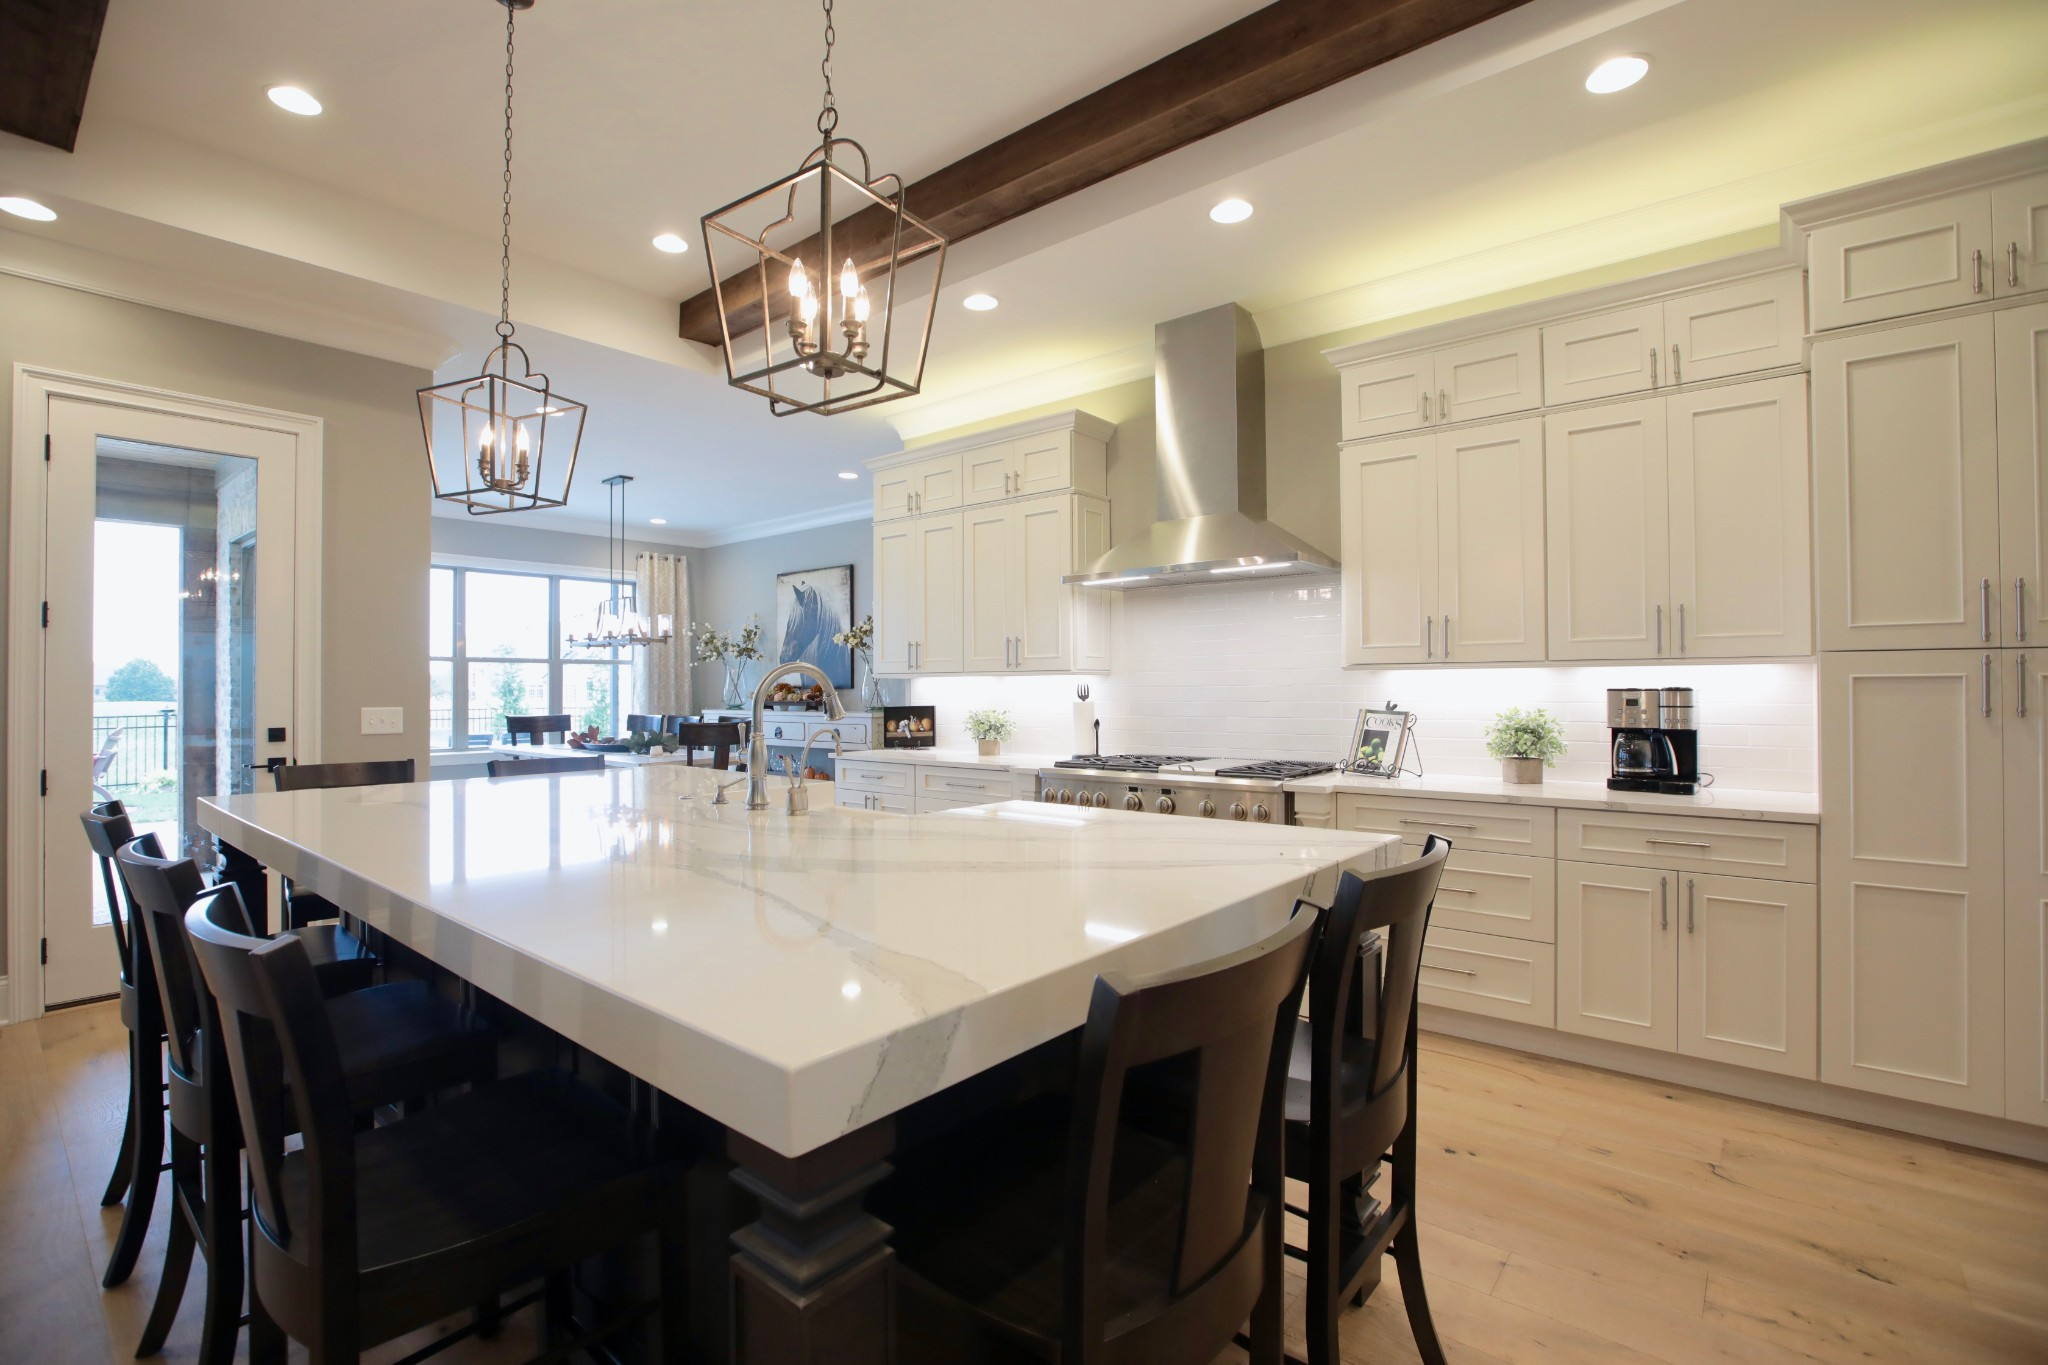 1267 Potter Ln, Gallatin, TN 37066 - Gallatin, TN real estate listing